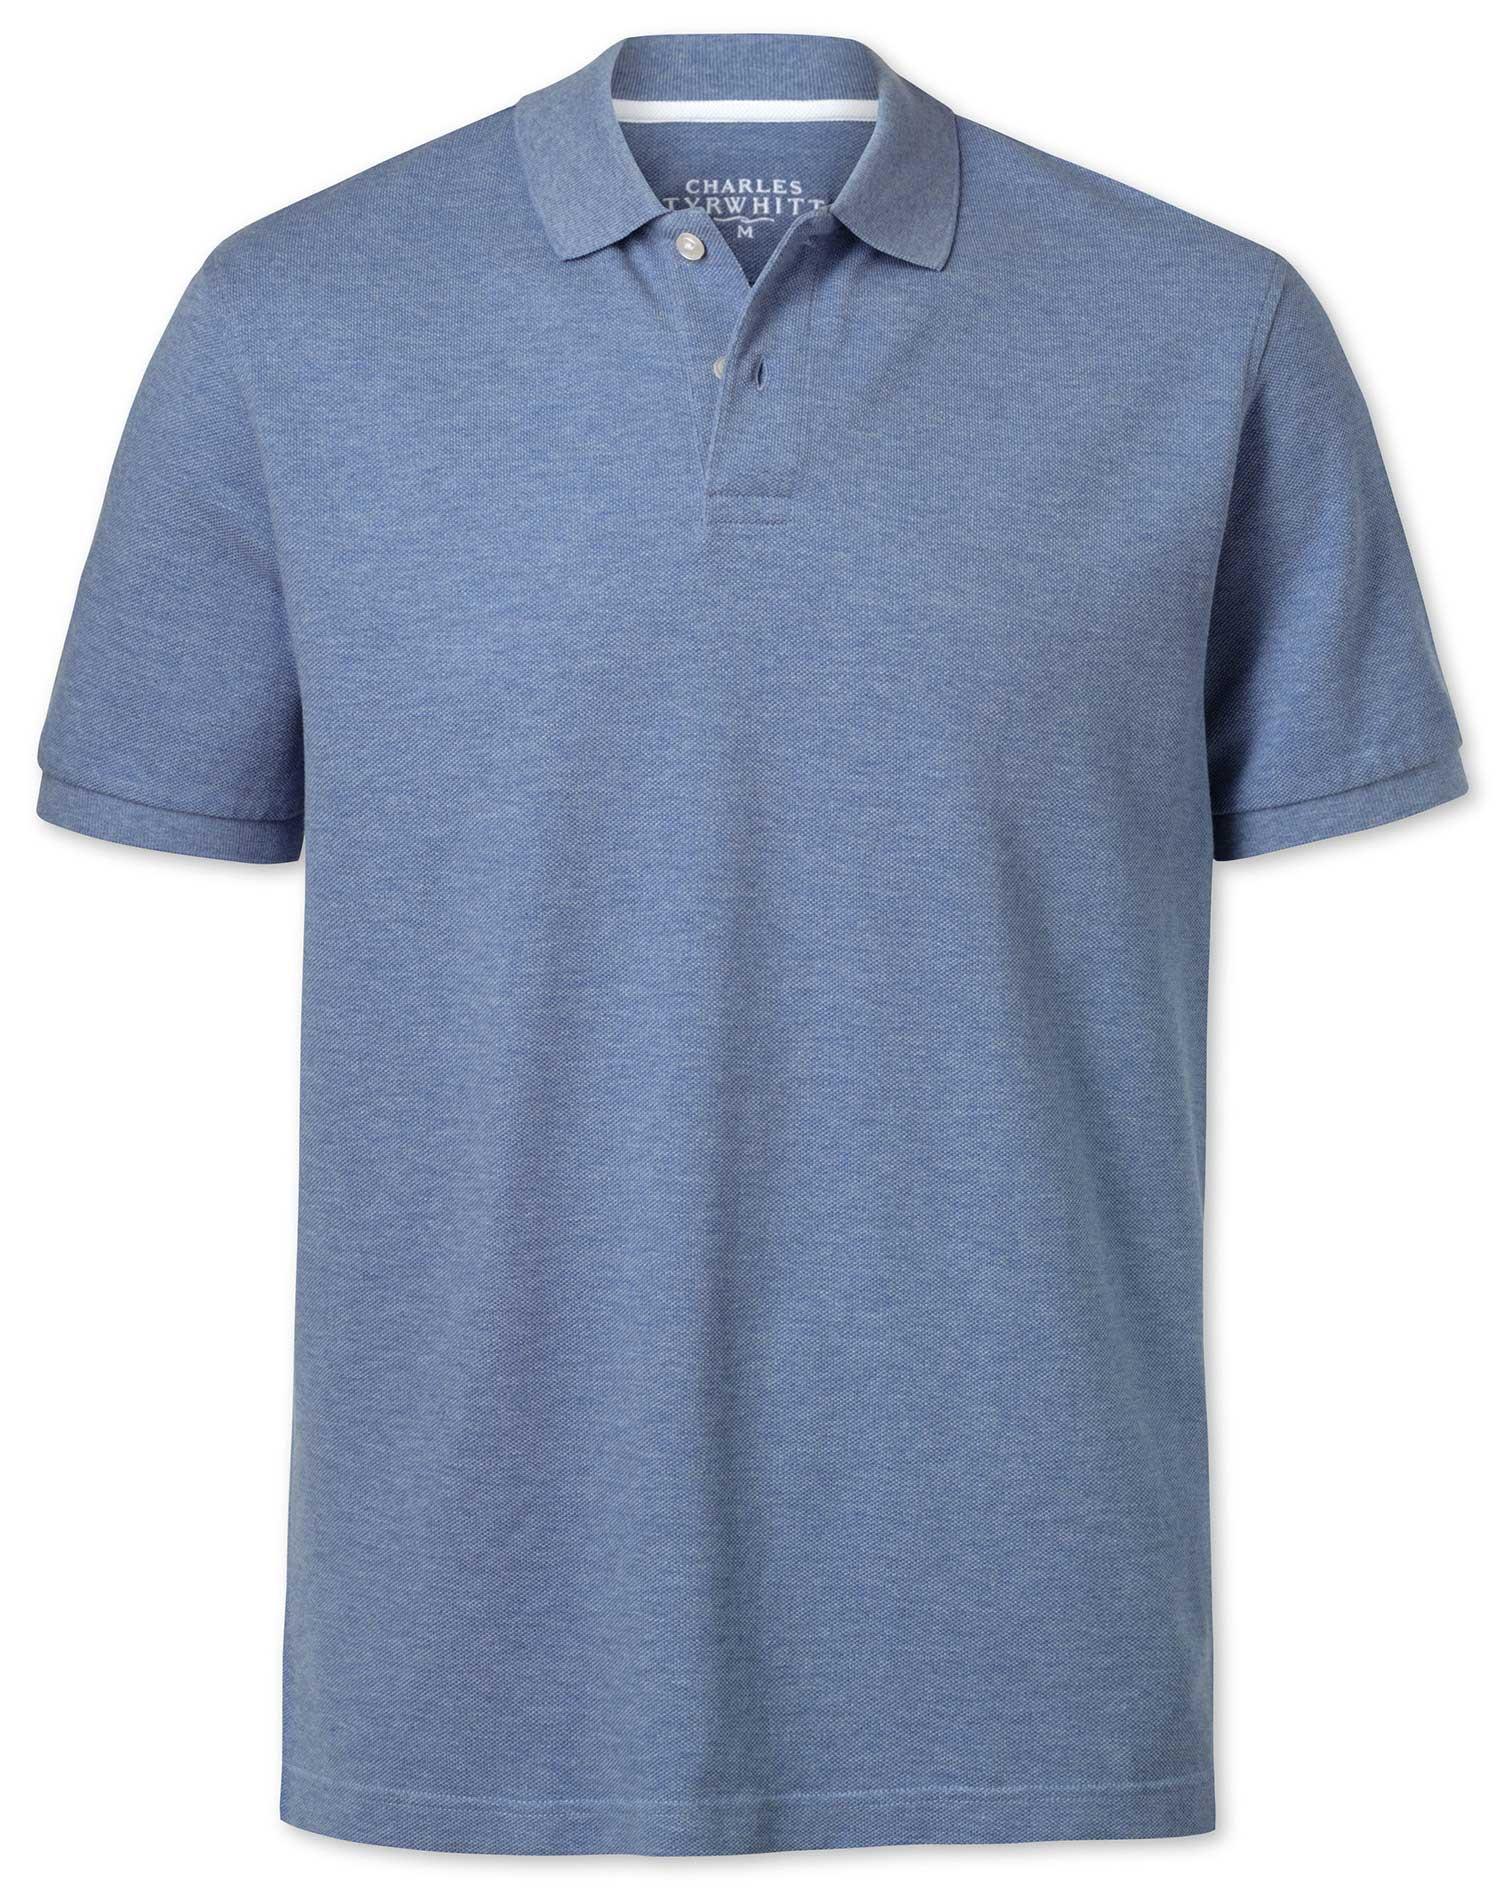 Sky Blue Melange Pique Cotton Polo Size XXXL by Charles Tyrwhitt